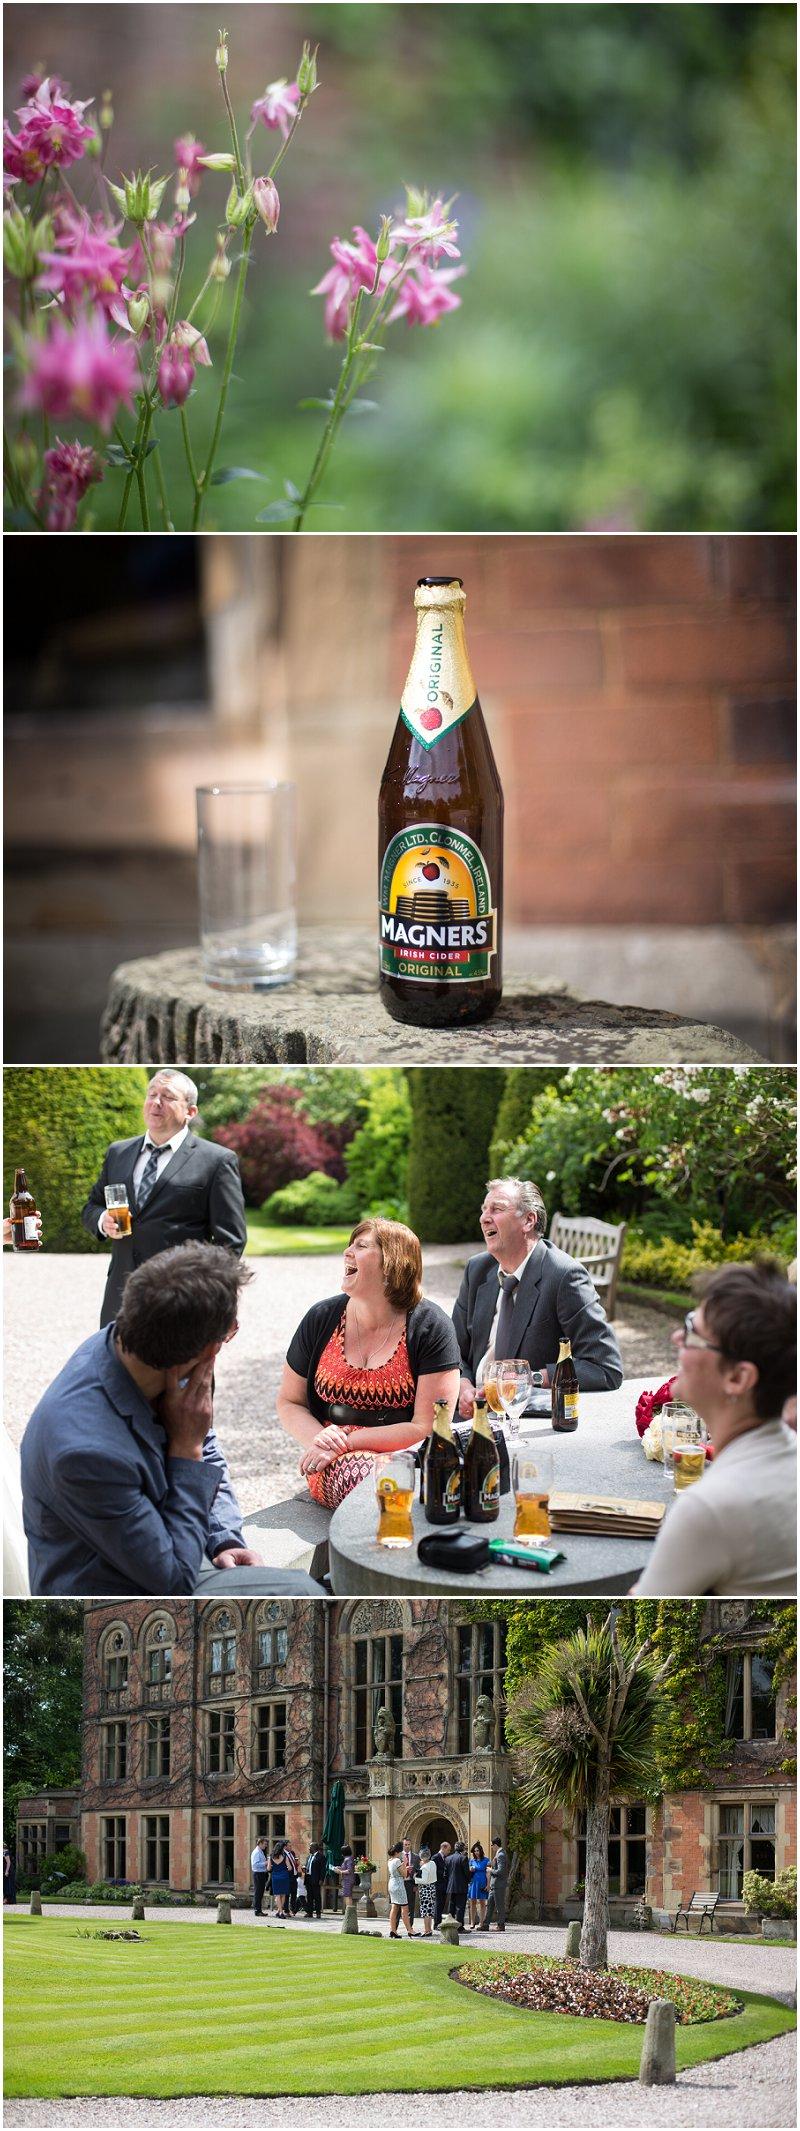 Beer, flowers, wedding reception in the gardens of wedding venue